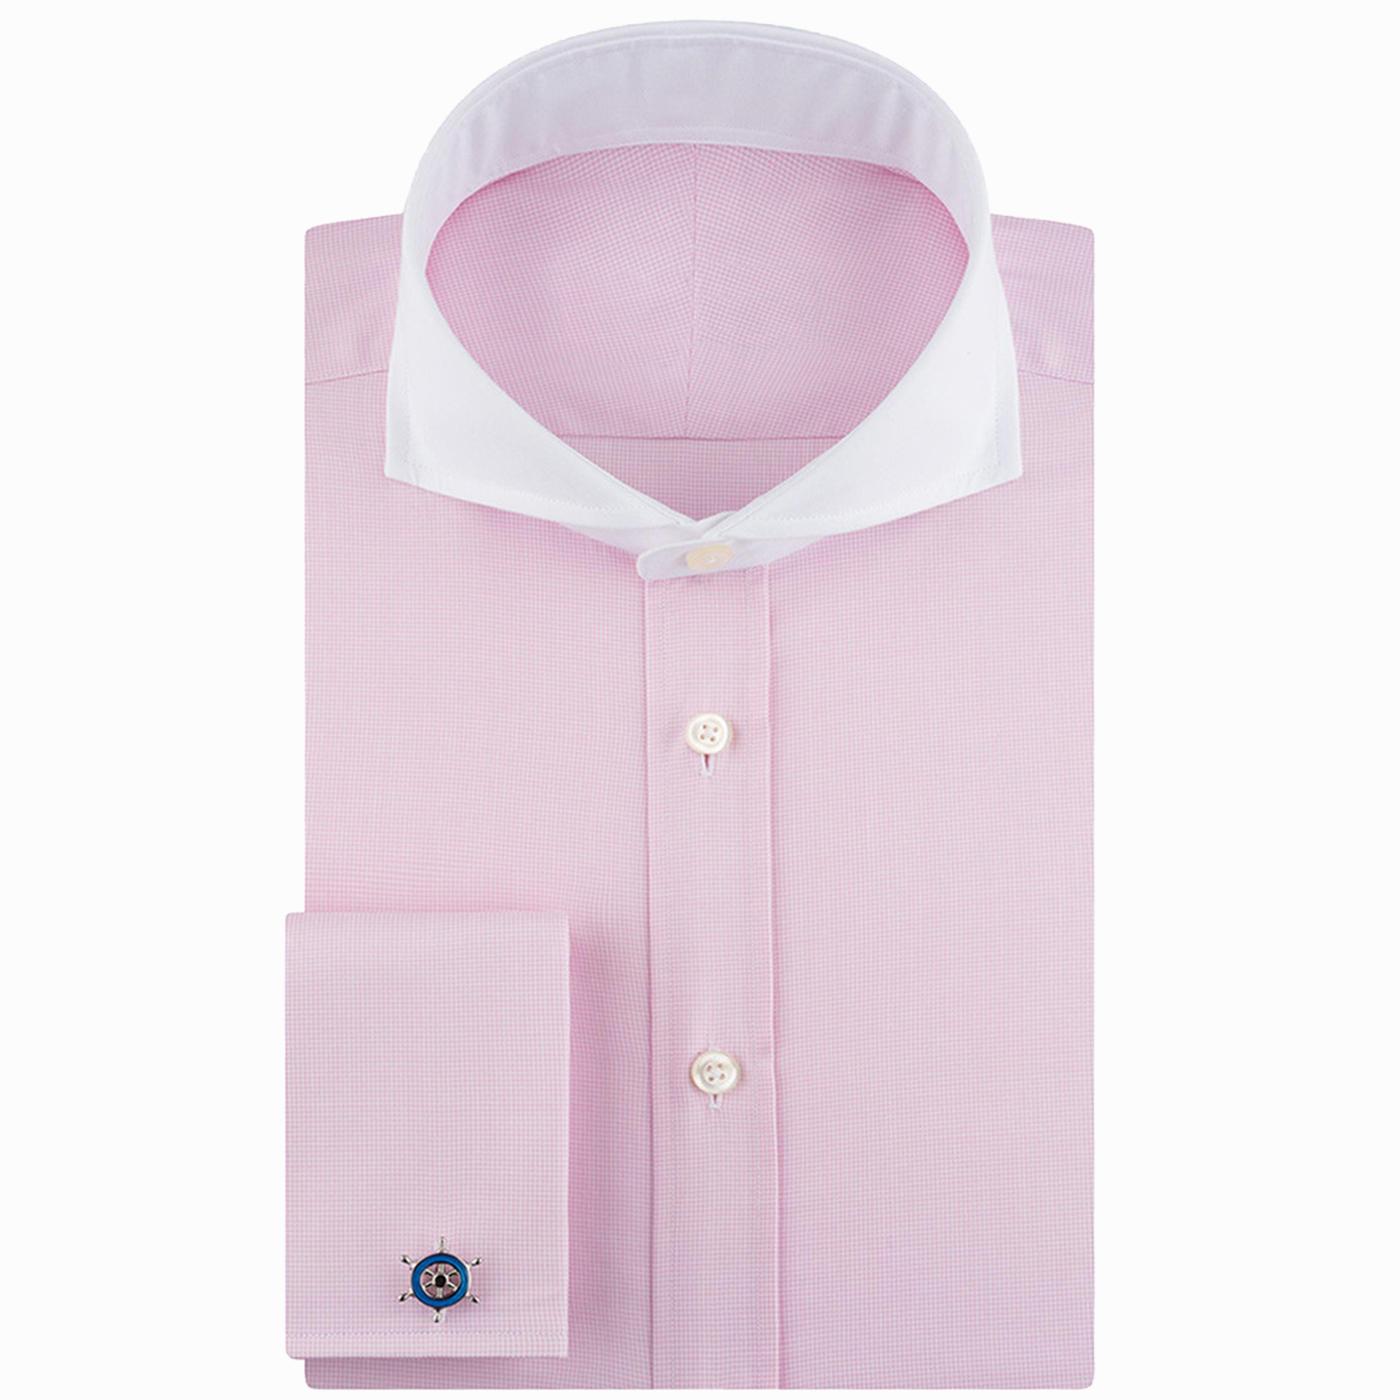 Shirt_11_Houndstooth-poplin_pink.jpg